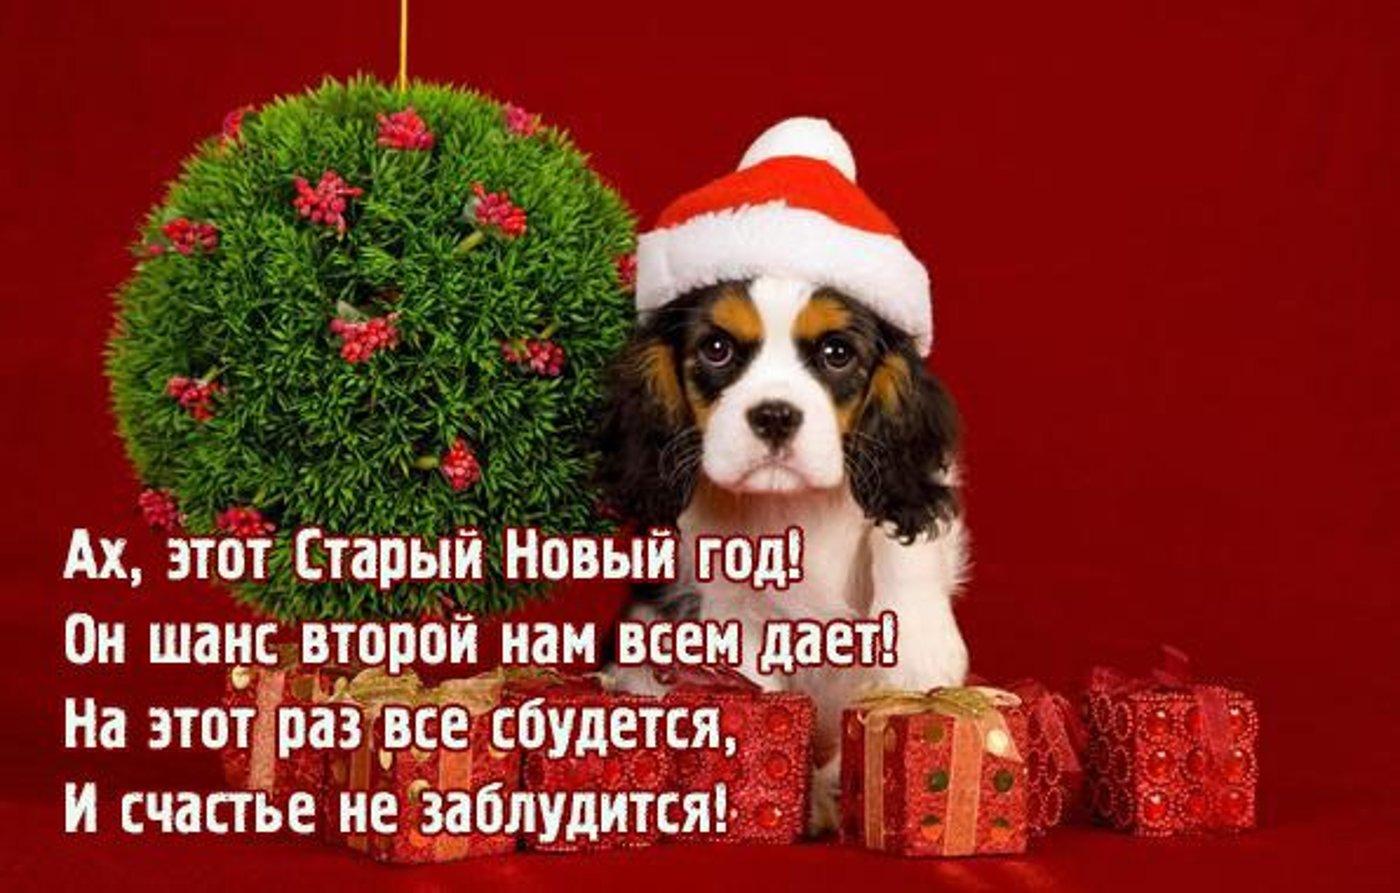 https://luckclub.ru/images/luckclub/2018/12/de804102296d454bb4a0-23.jpg